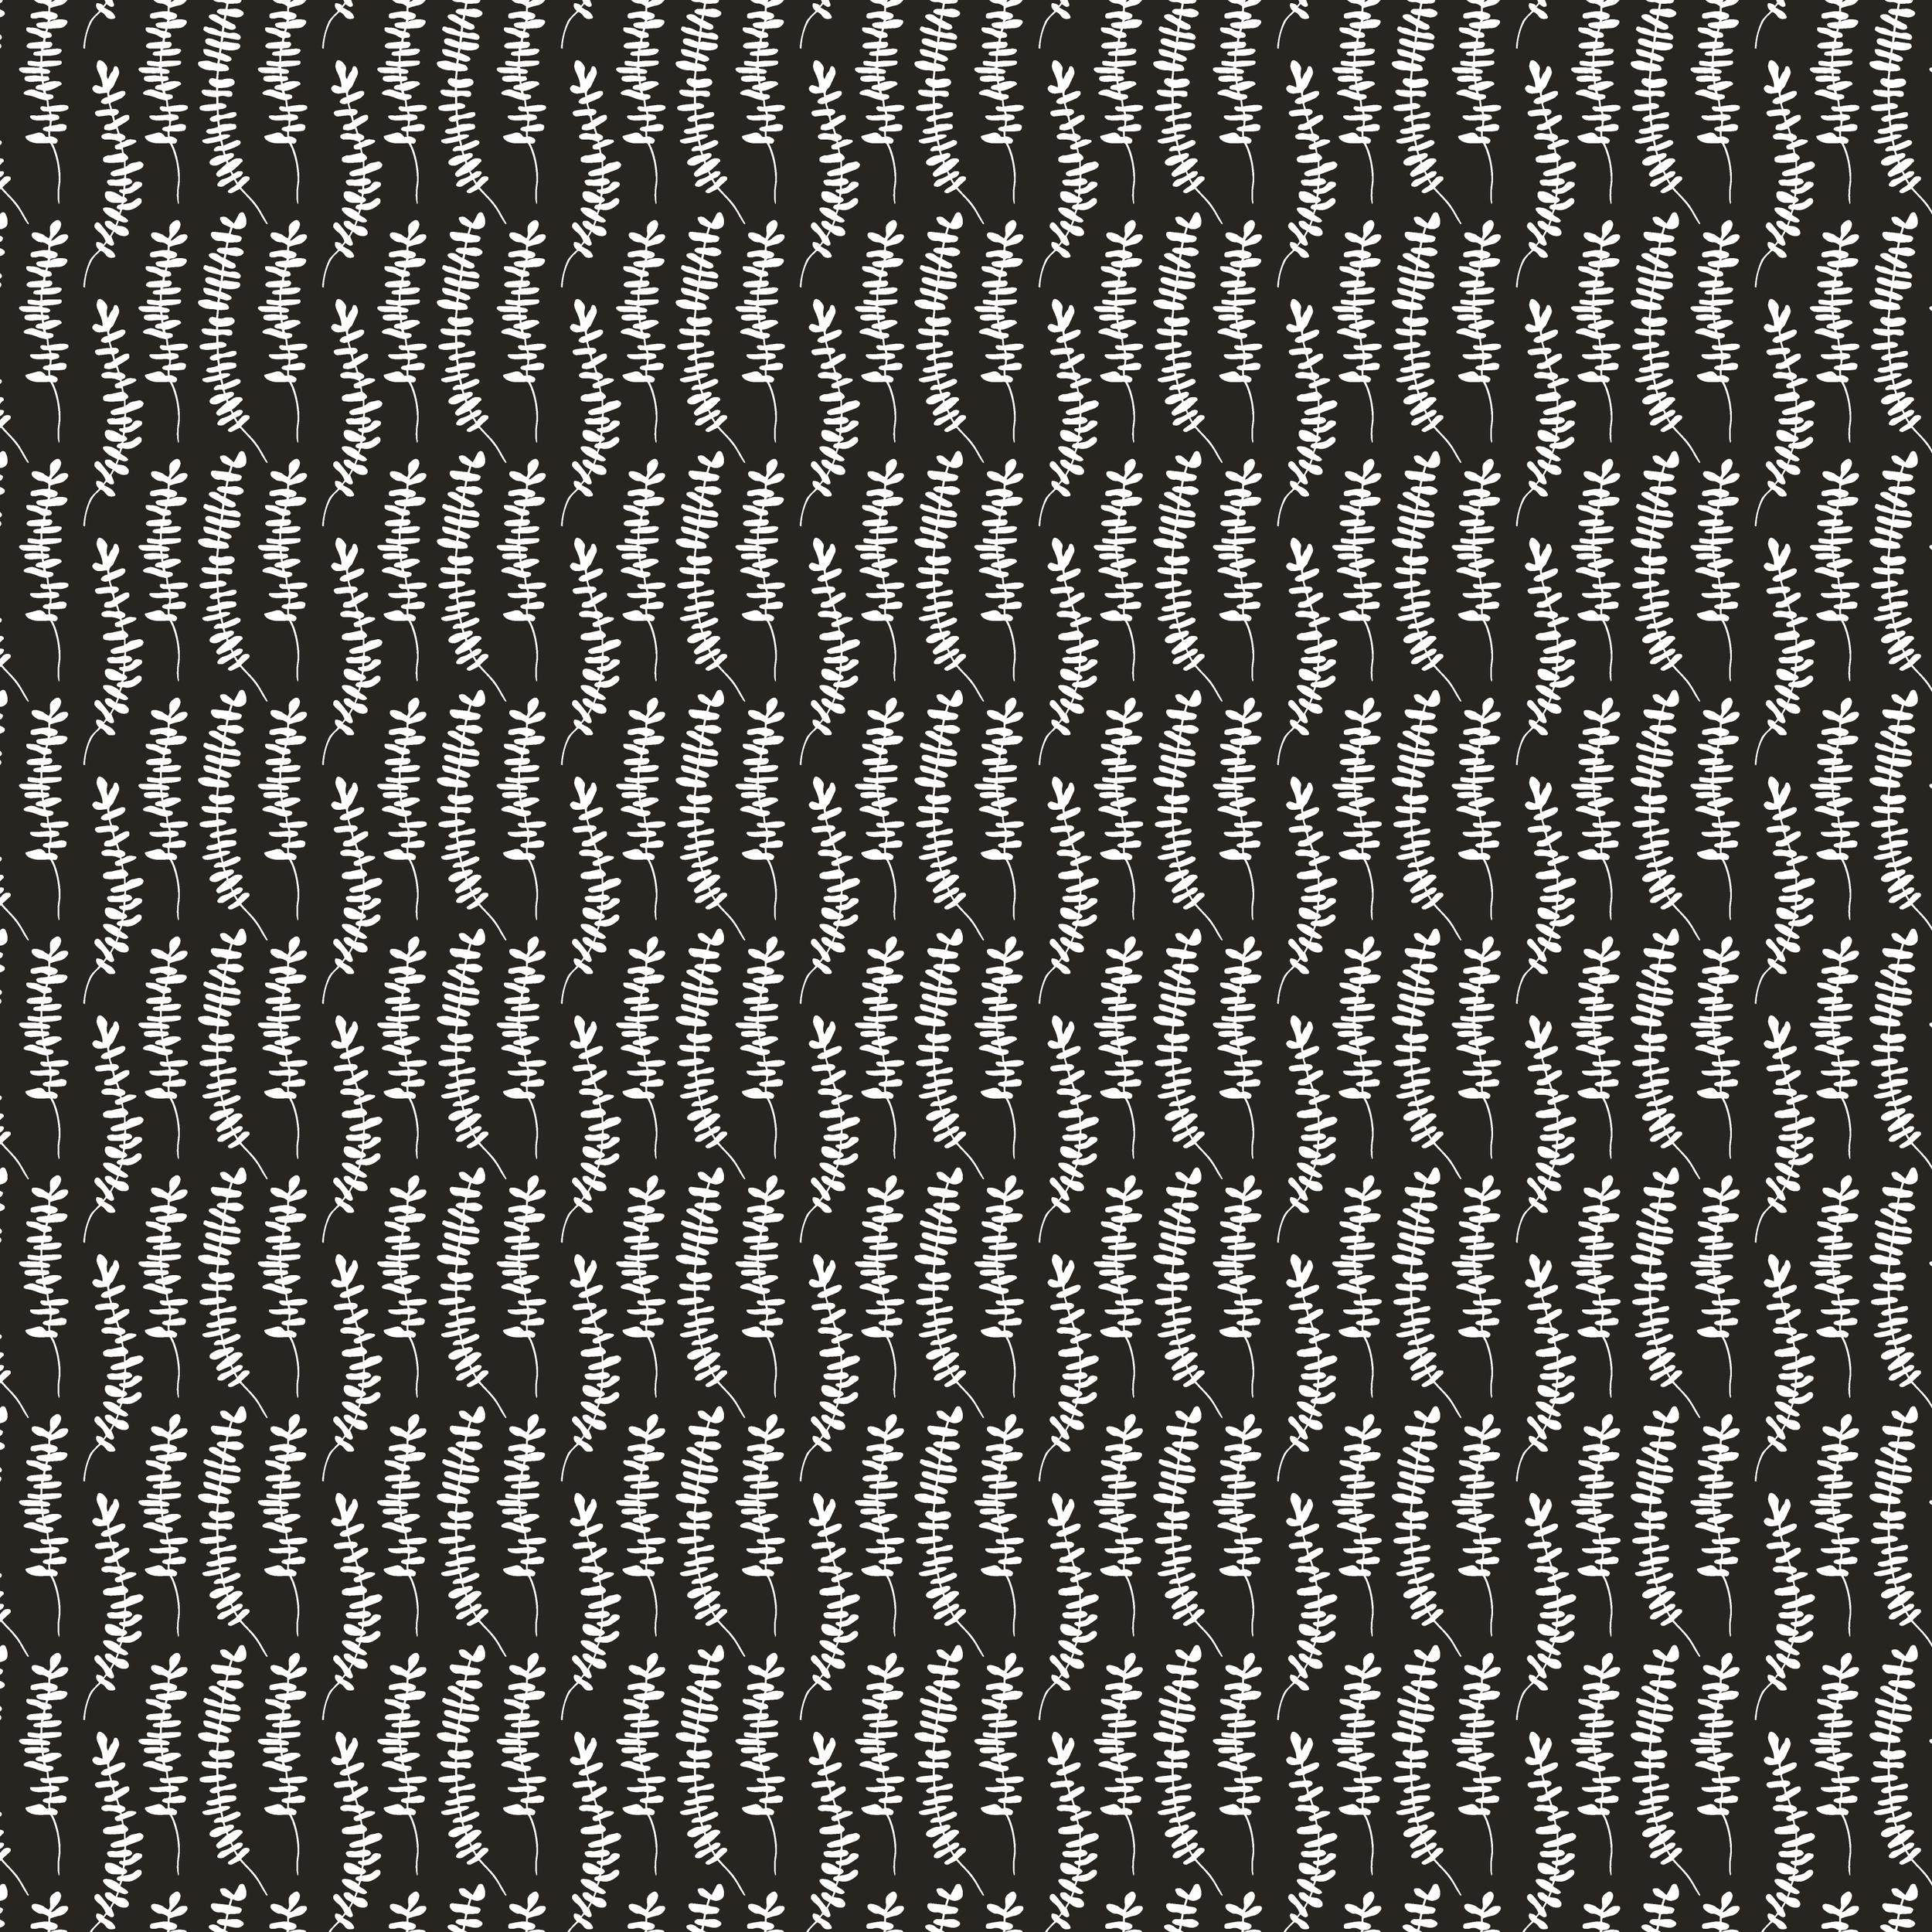 LWLP Patterns_Leaves_Dune Dark_PNG.png